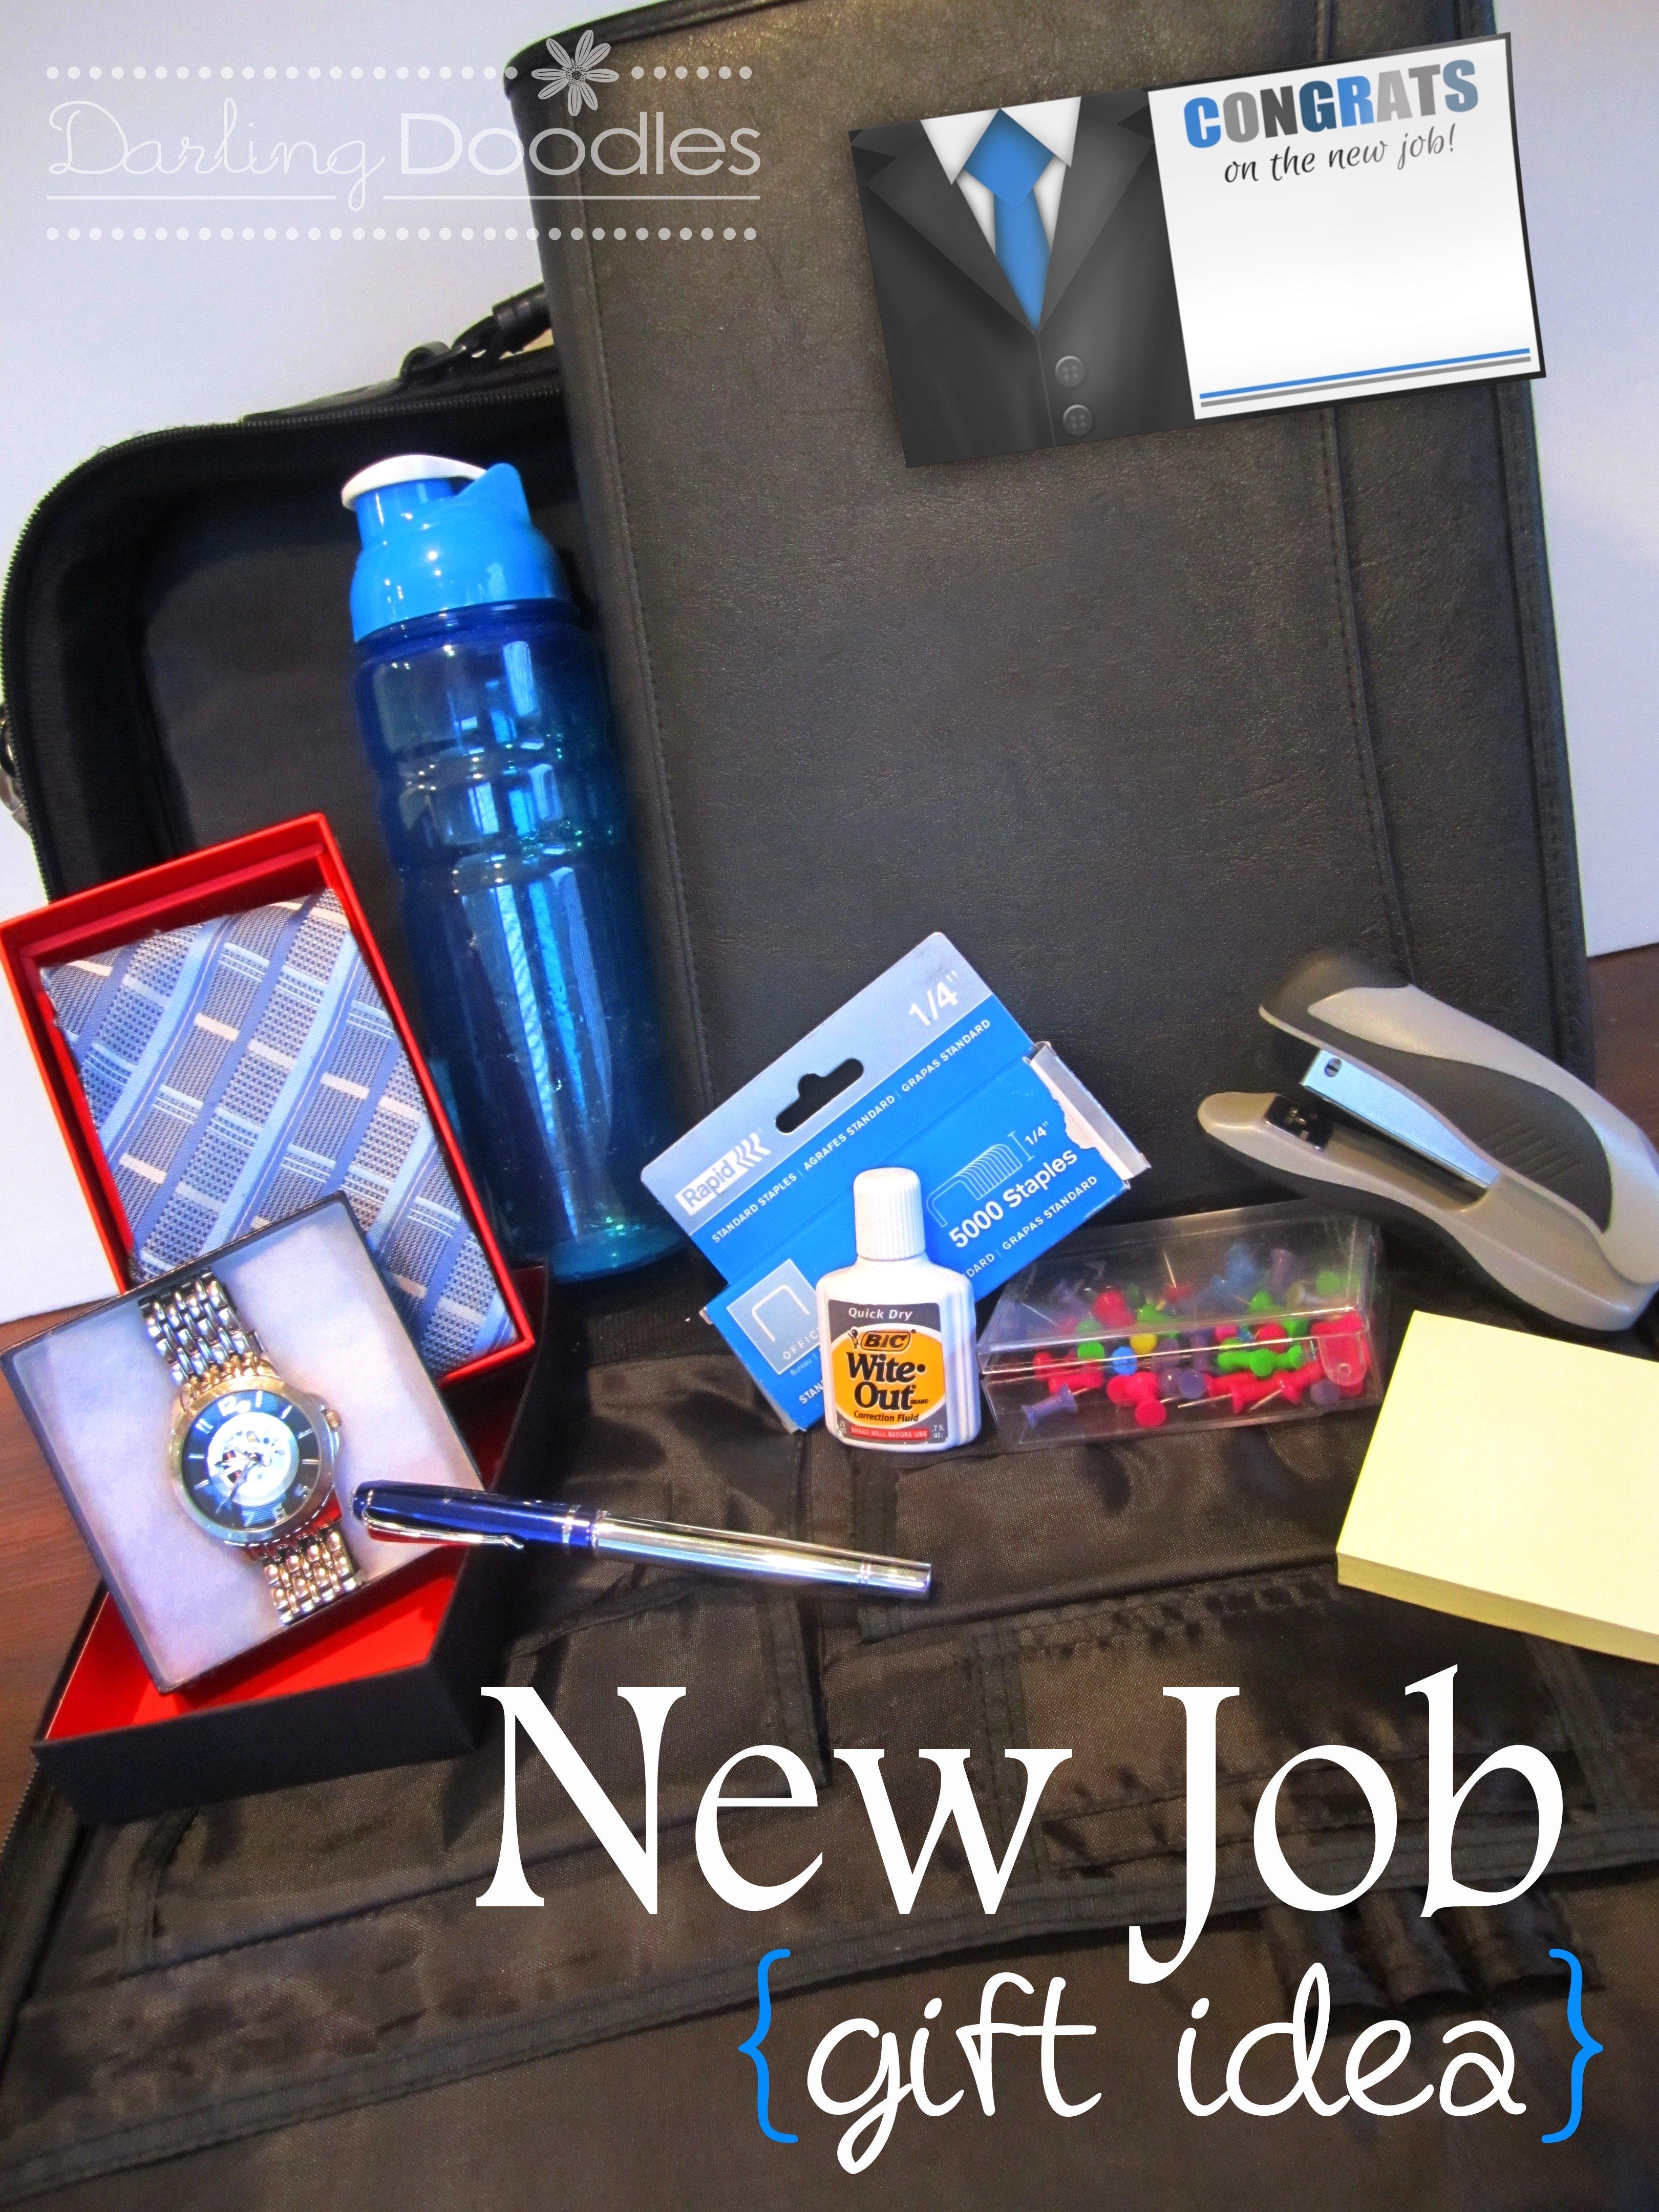 10 Stylish Gift Ideas For A New Boyfriend gift ideas for boyfriend gift ideas for boyfriends new job 4 2020